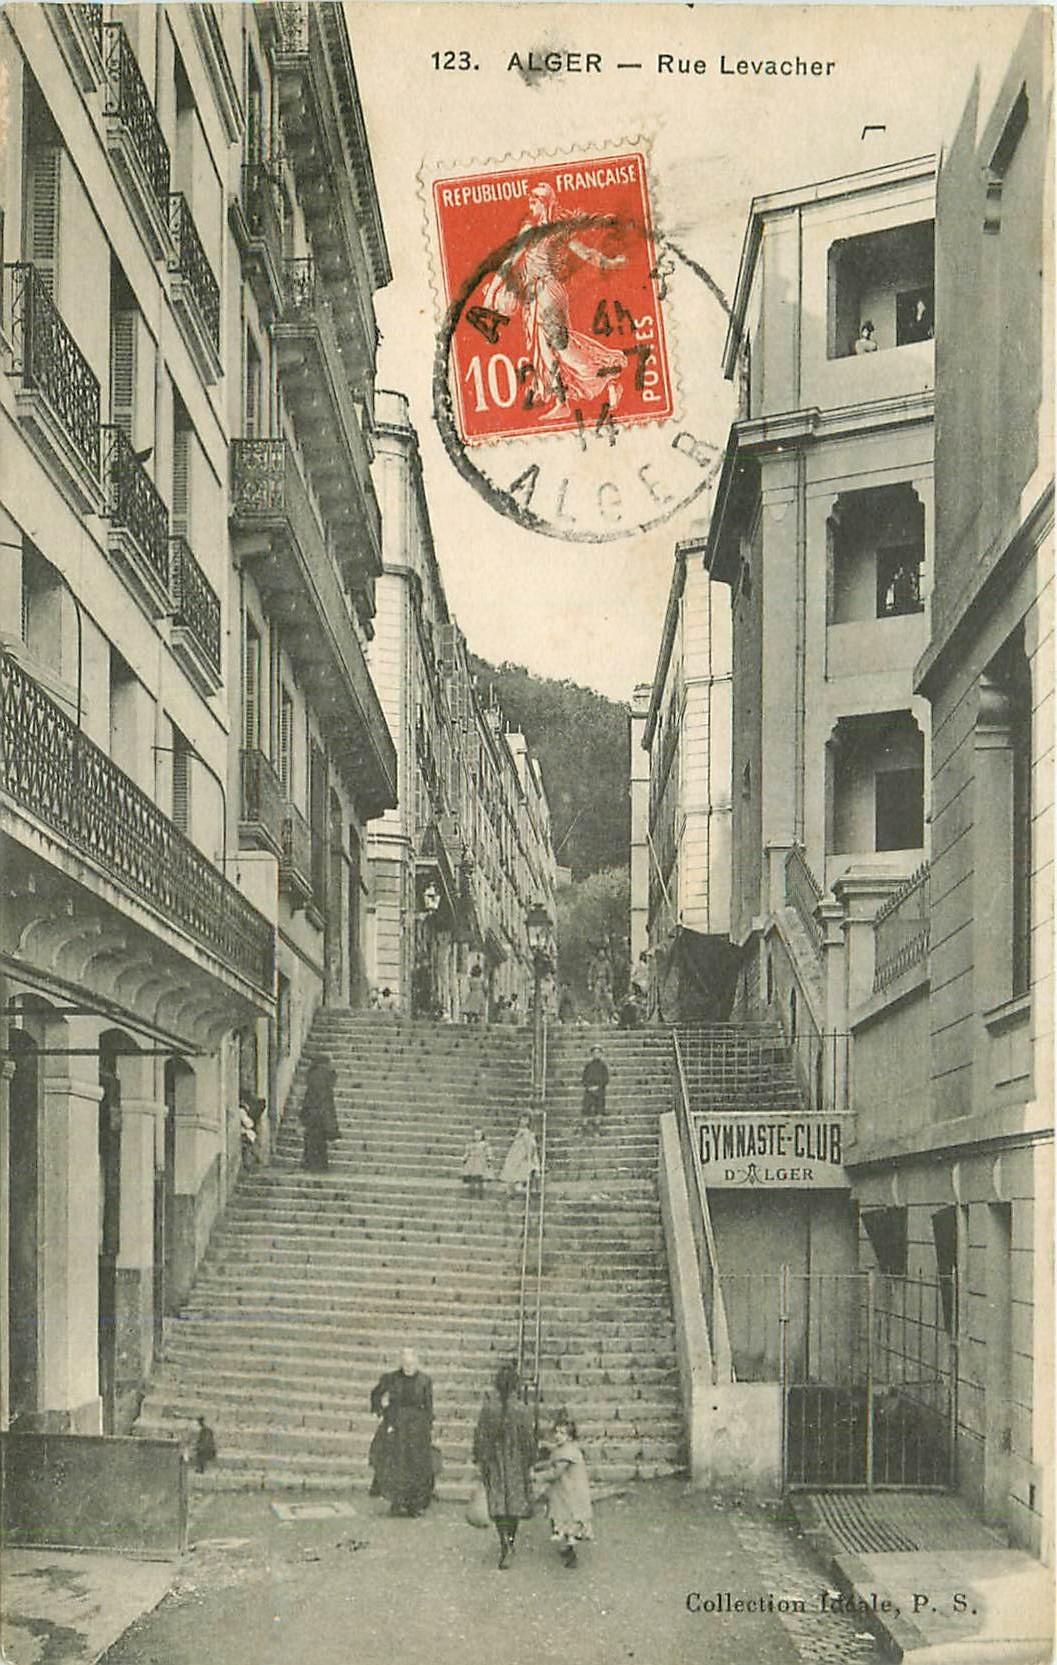 ALGER. Gymnaste-Club rue Levacher 1914